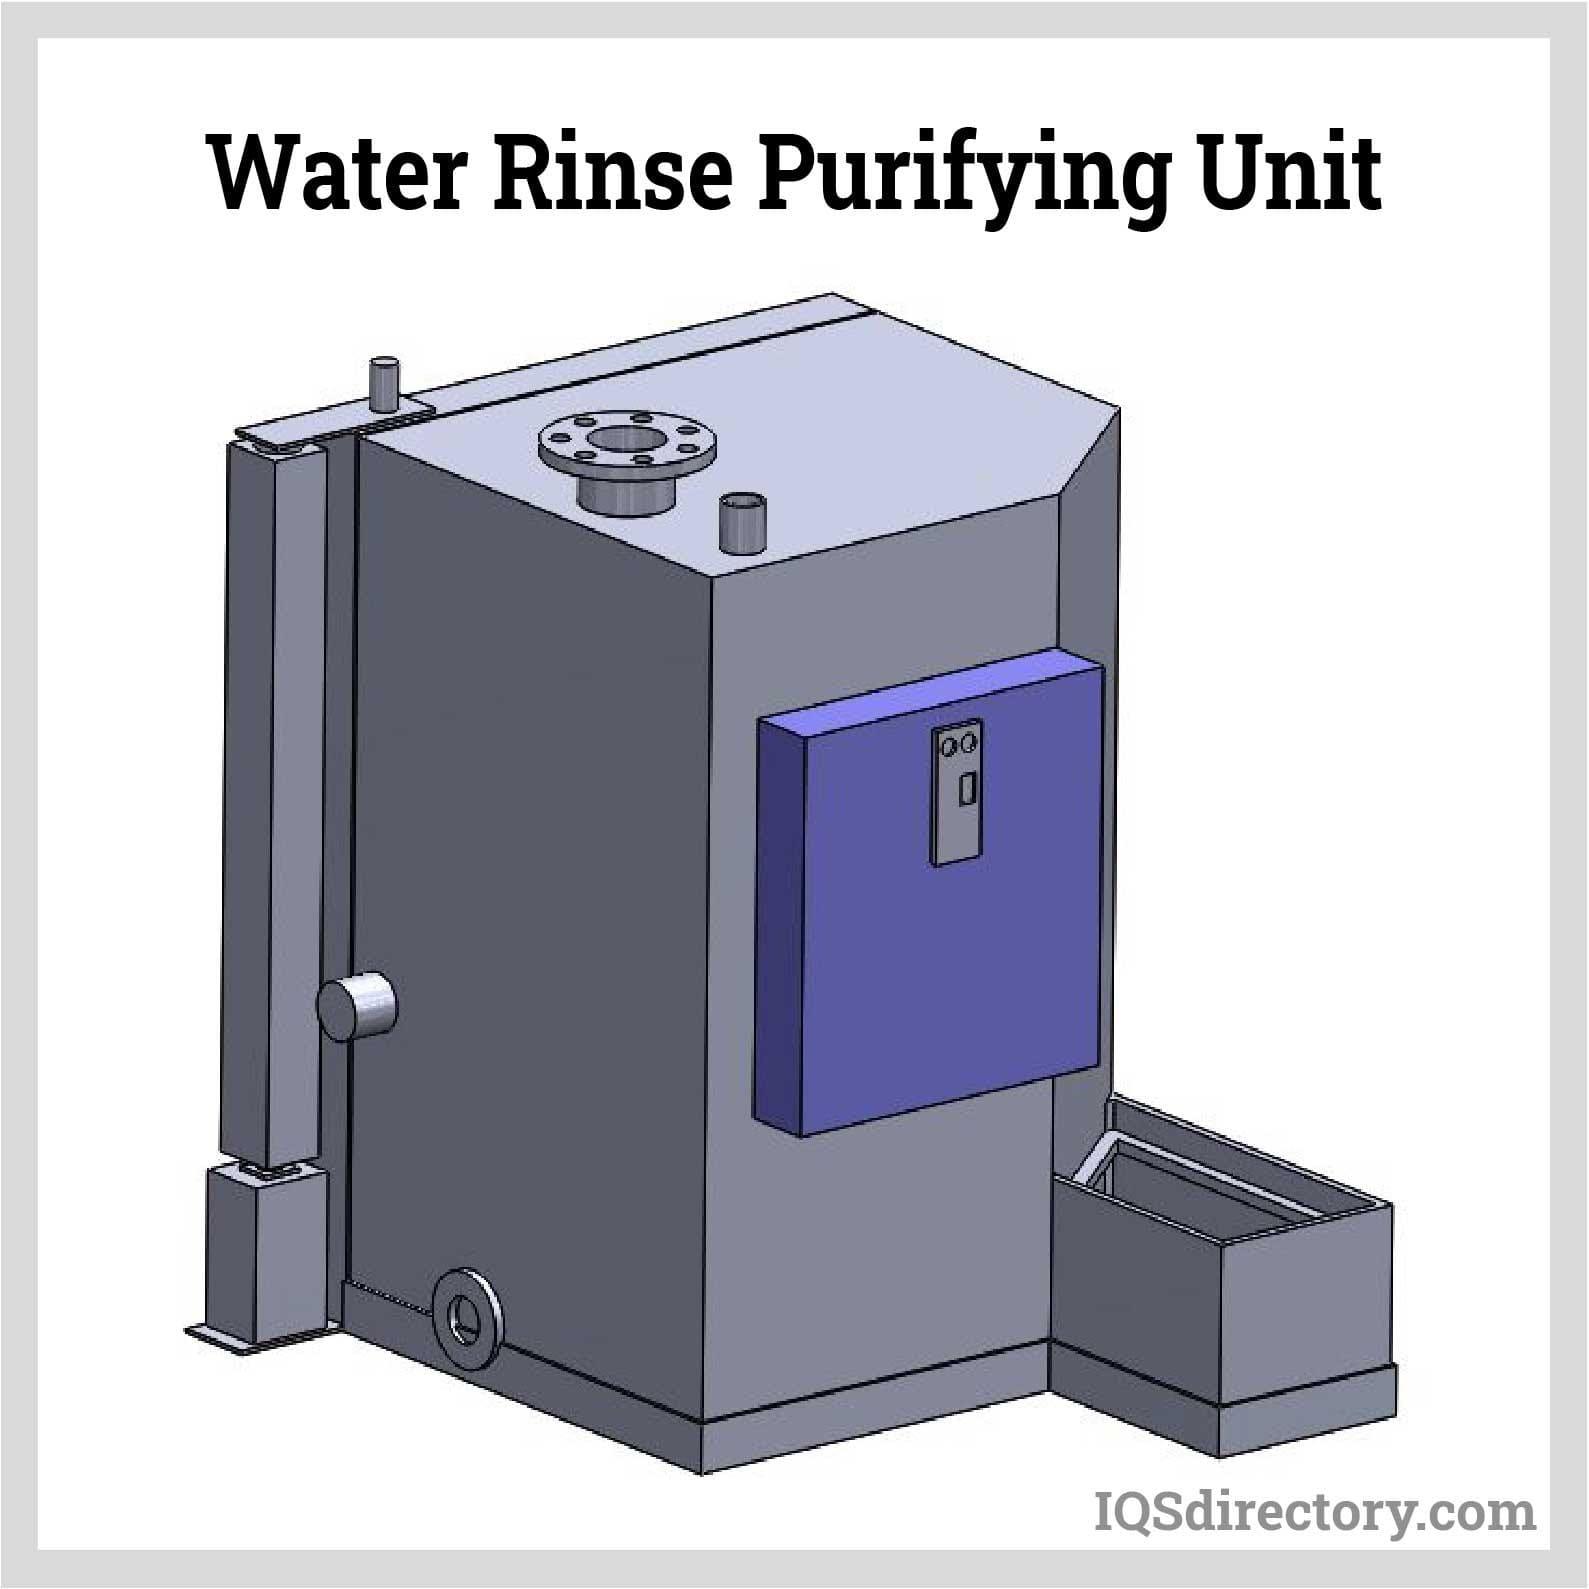 Water Rinse Purifying Unit